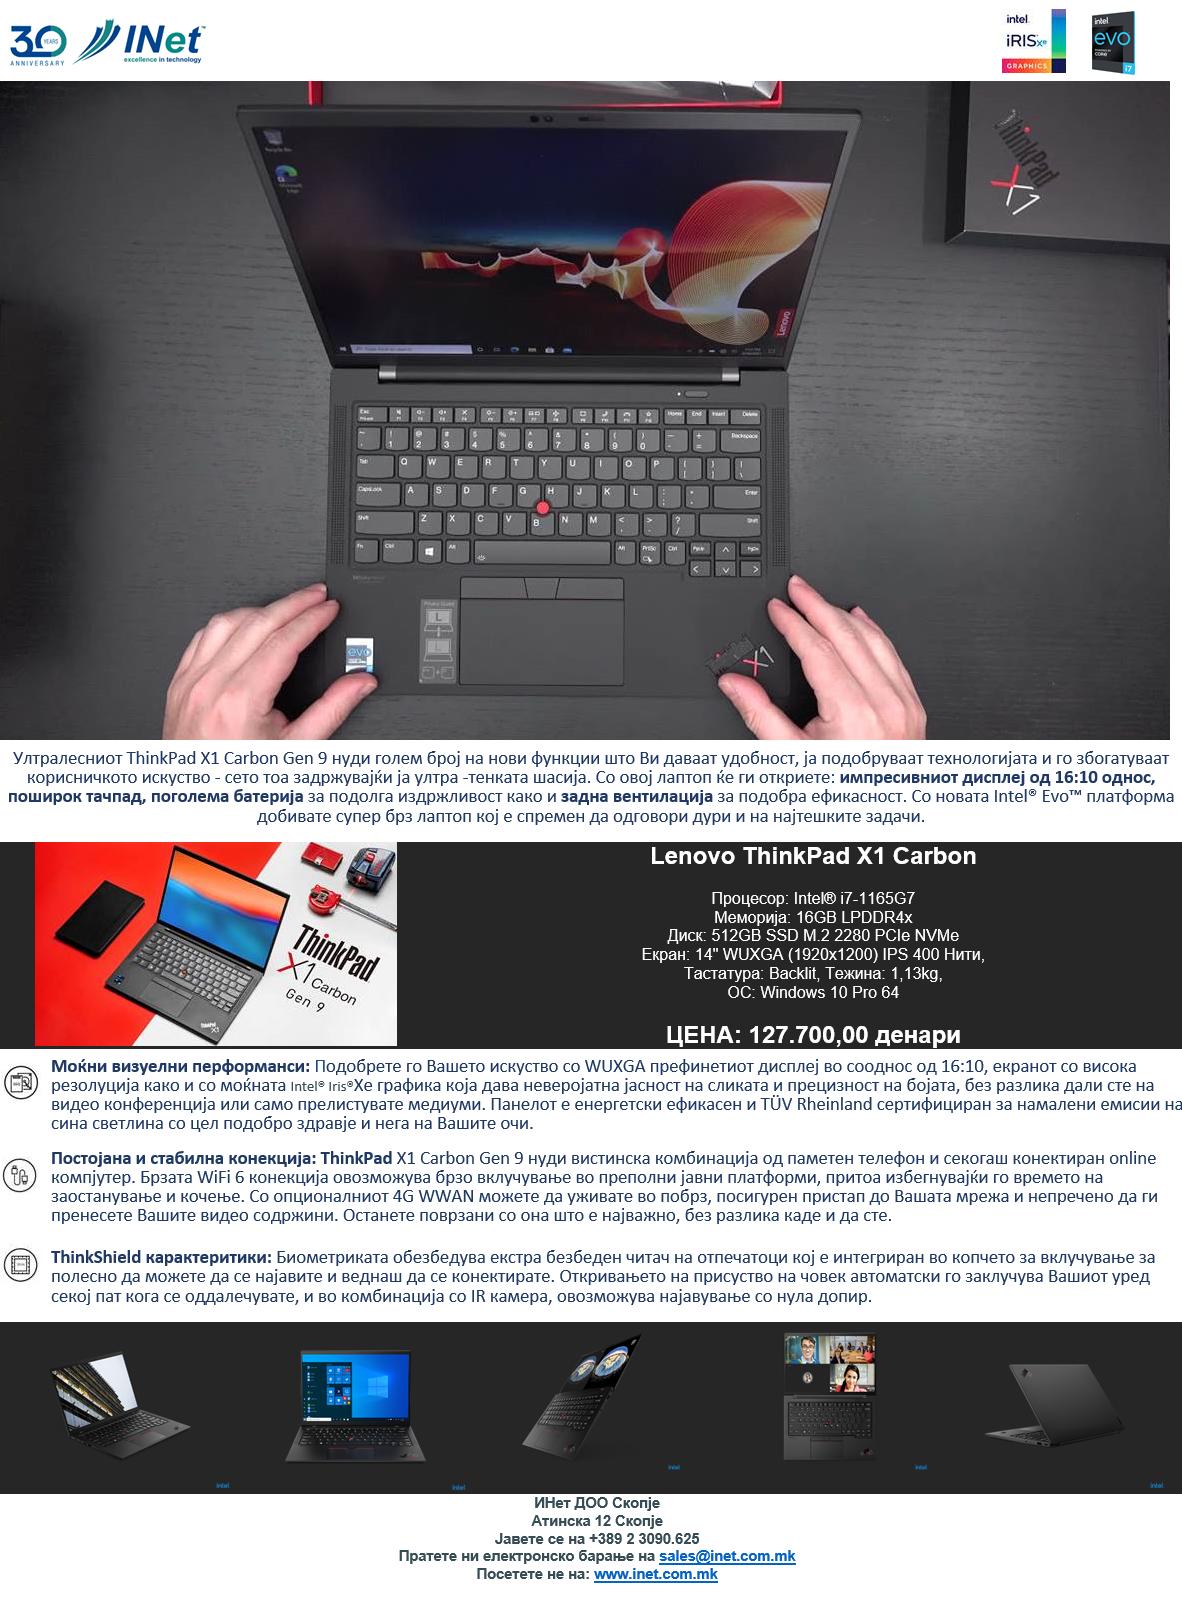 Lenovo PROMO Lenovo ThinkPad X1 Carbon Gen 9 - Moknost i prenoslivost vo premium paket